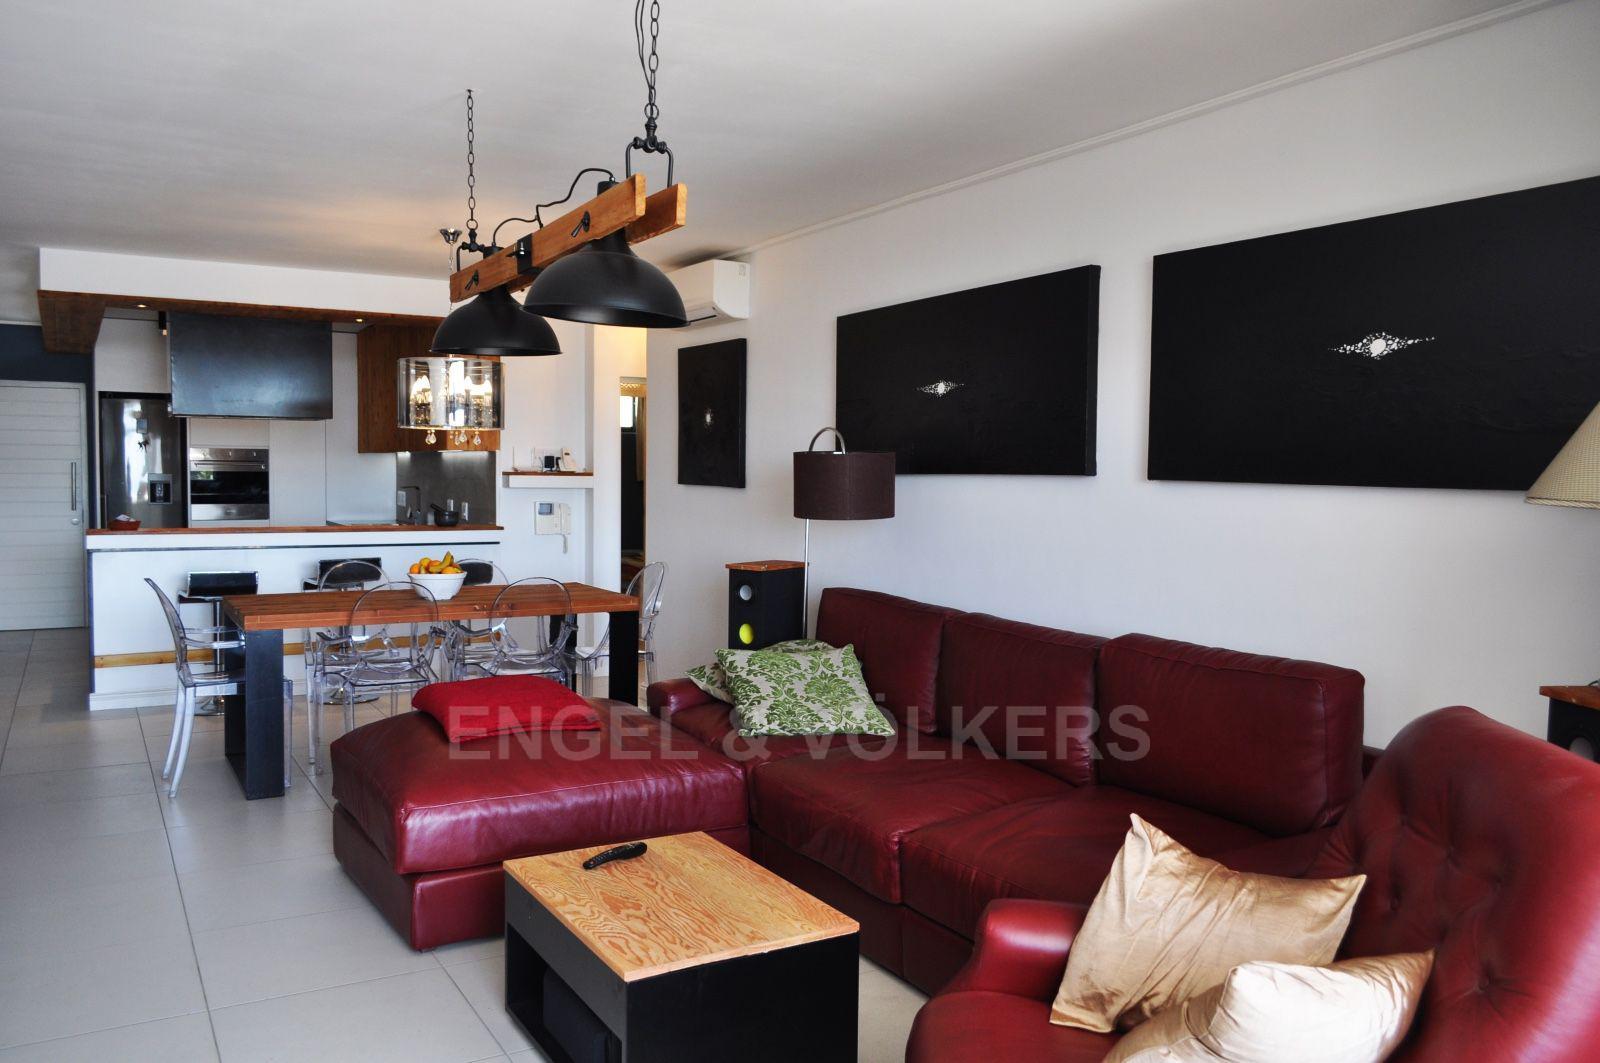 De Waterkant property for sale. Ref No: 13450081. Picture no 8